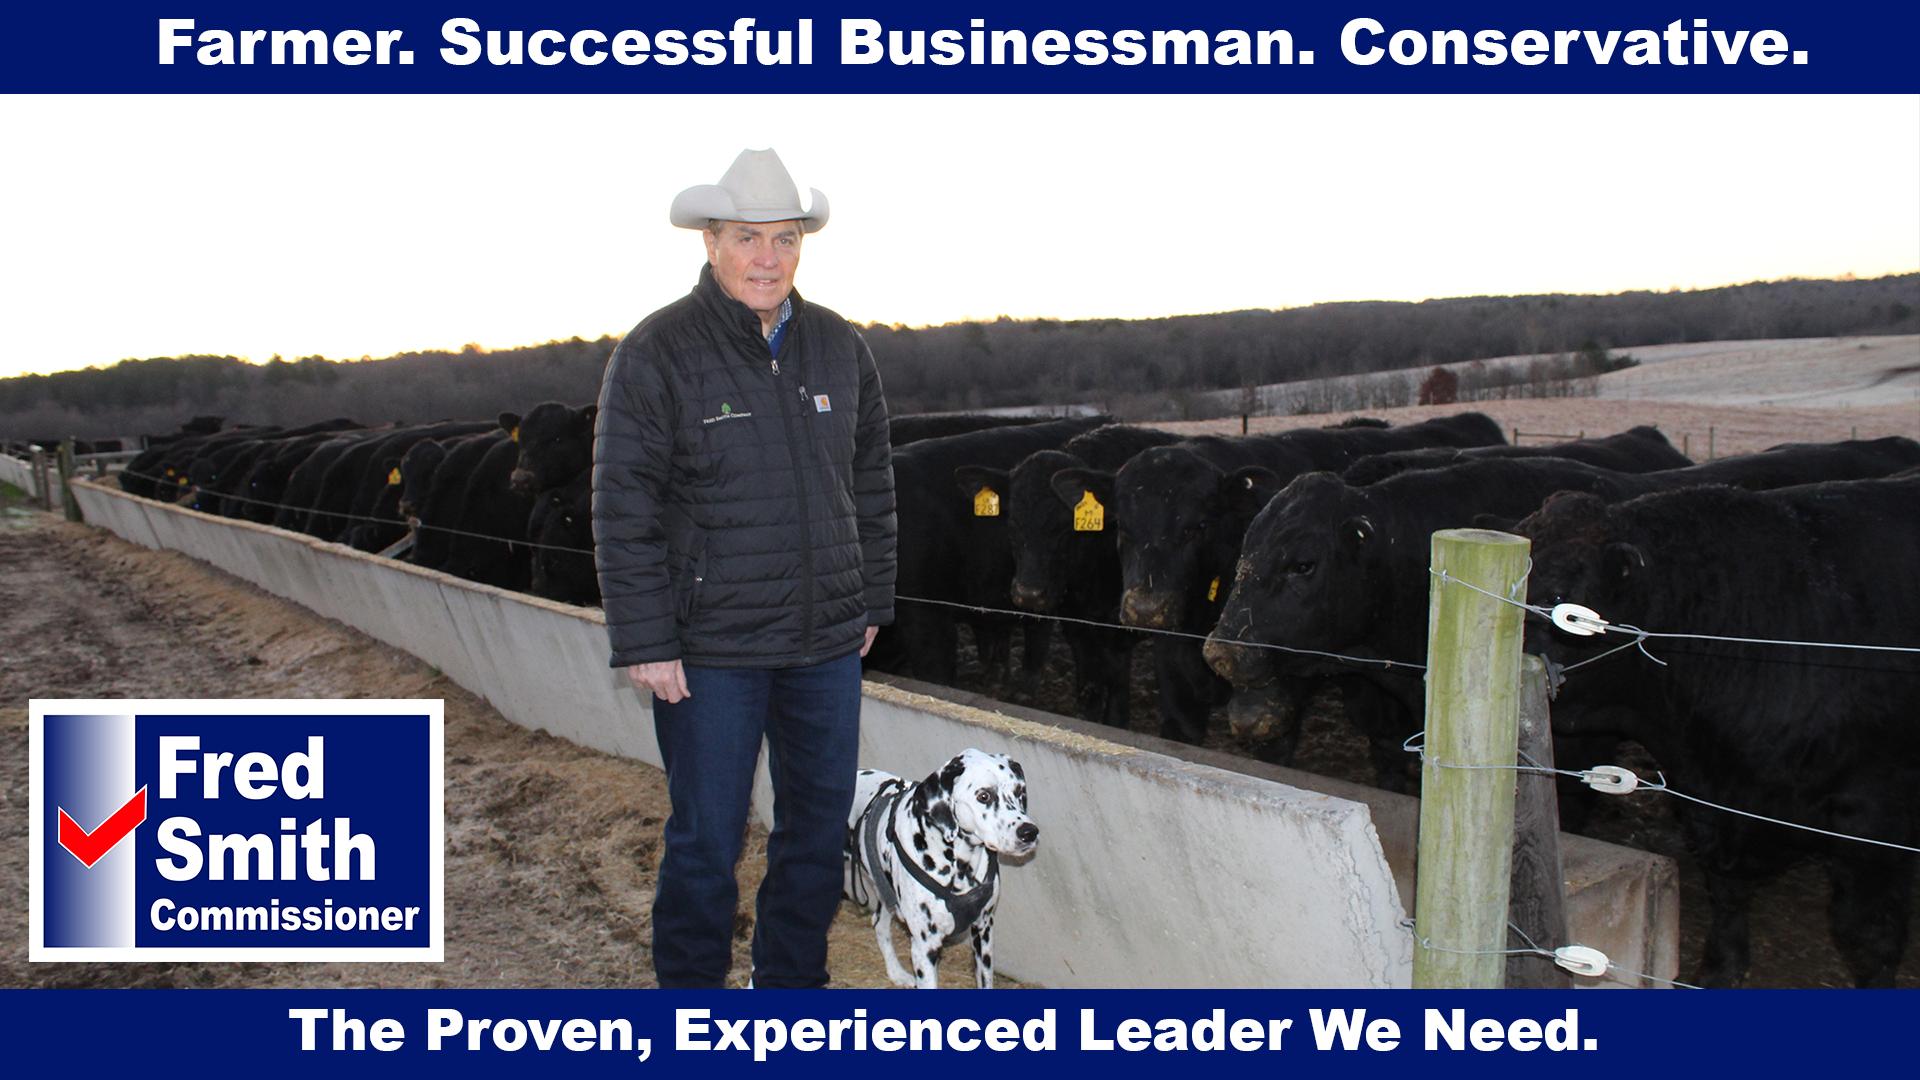 Farmer, Successful Businessman